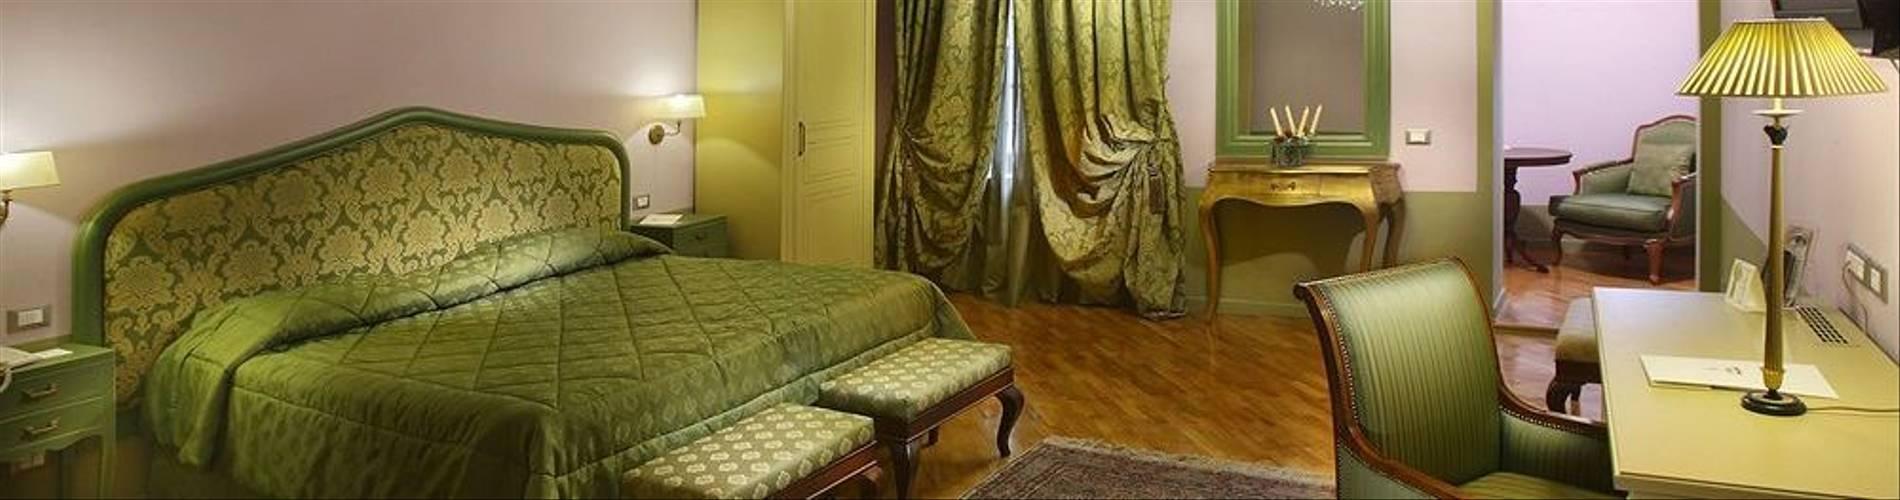 08-Hotel San Luca Palace.jpg